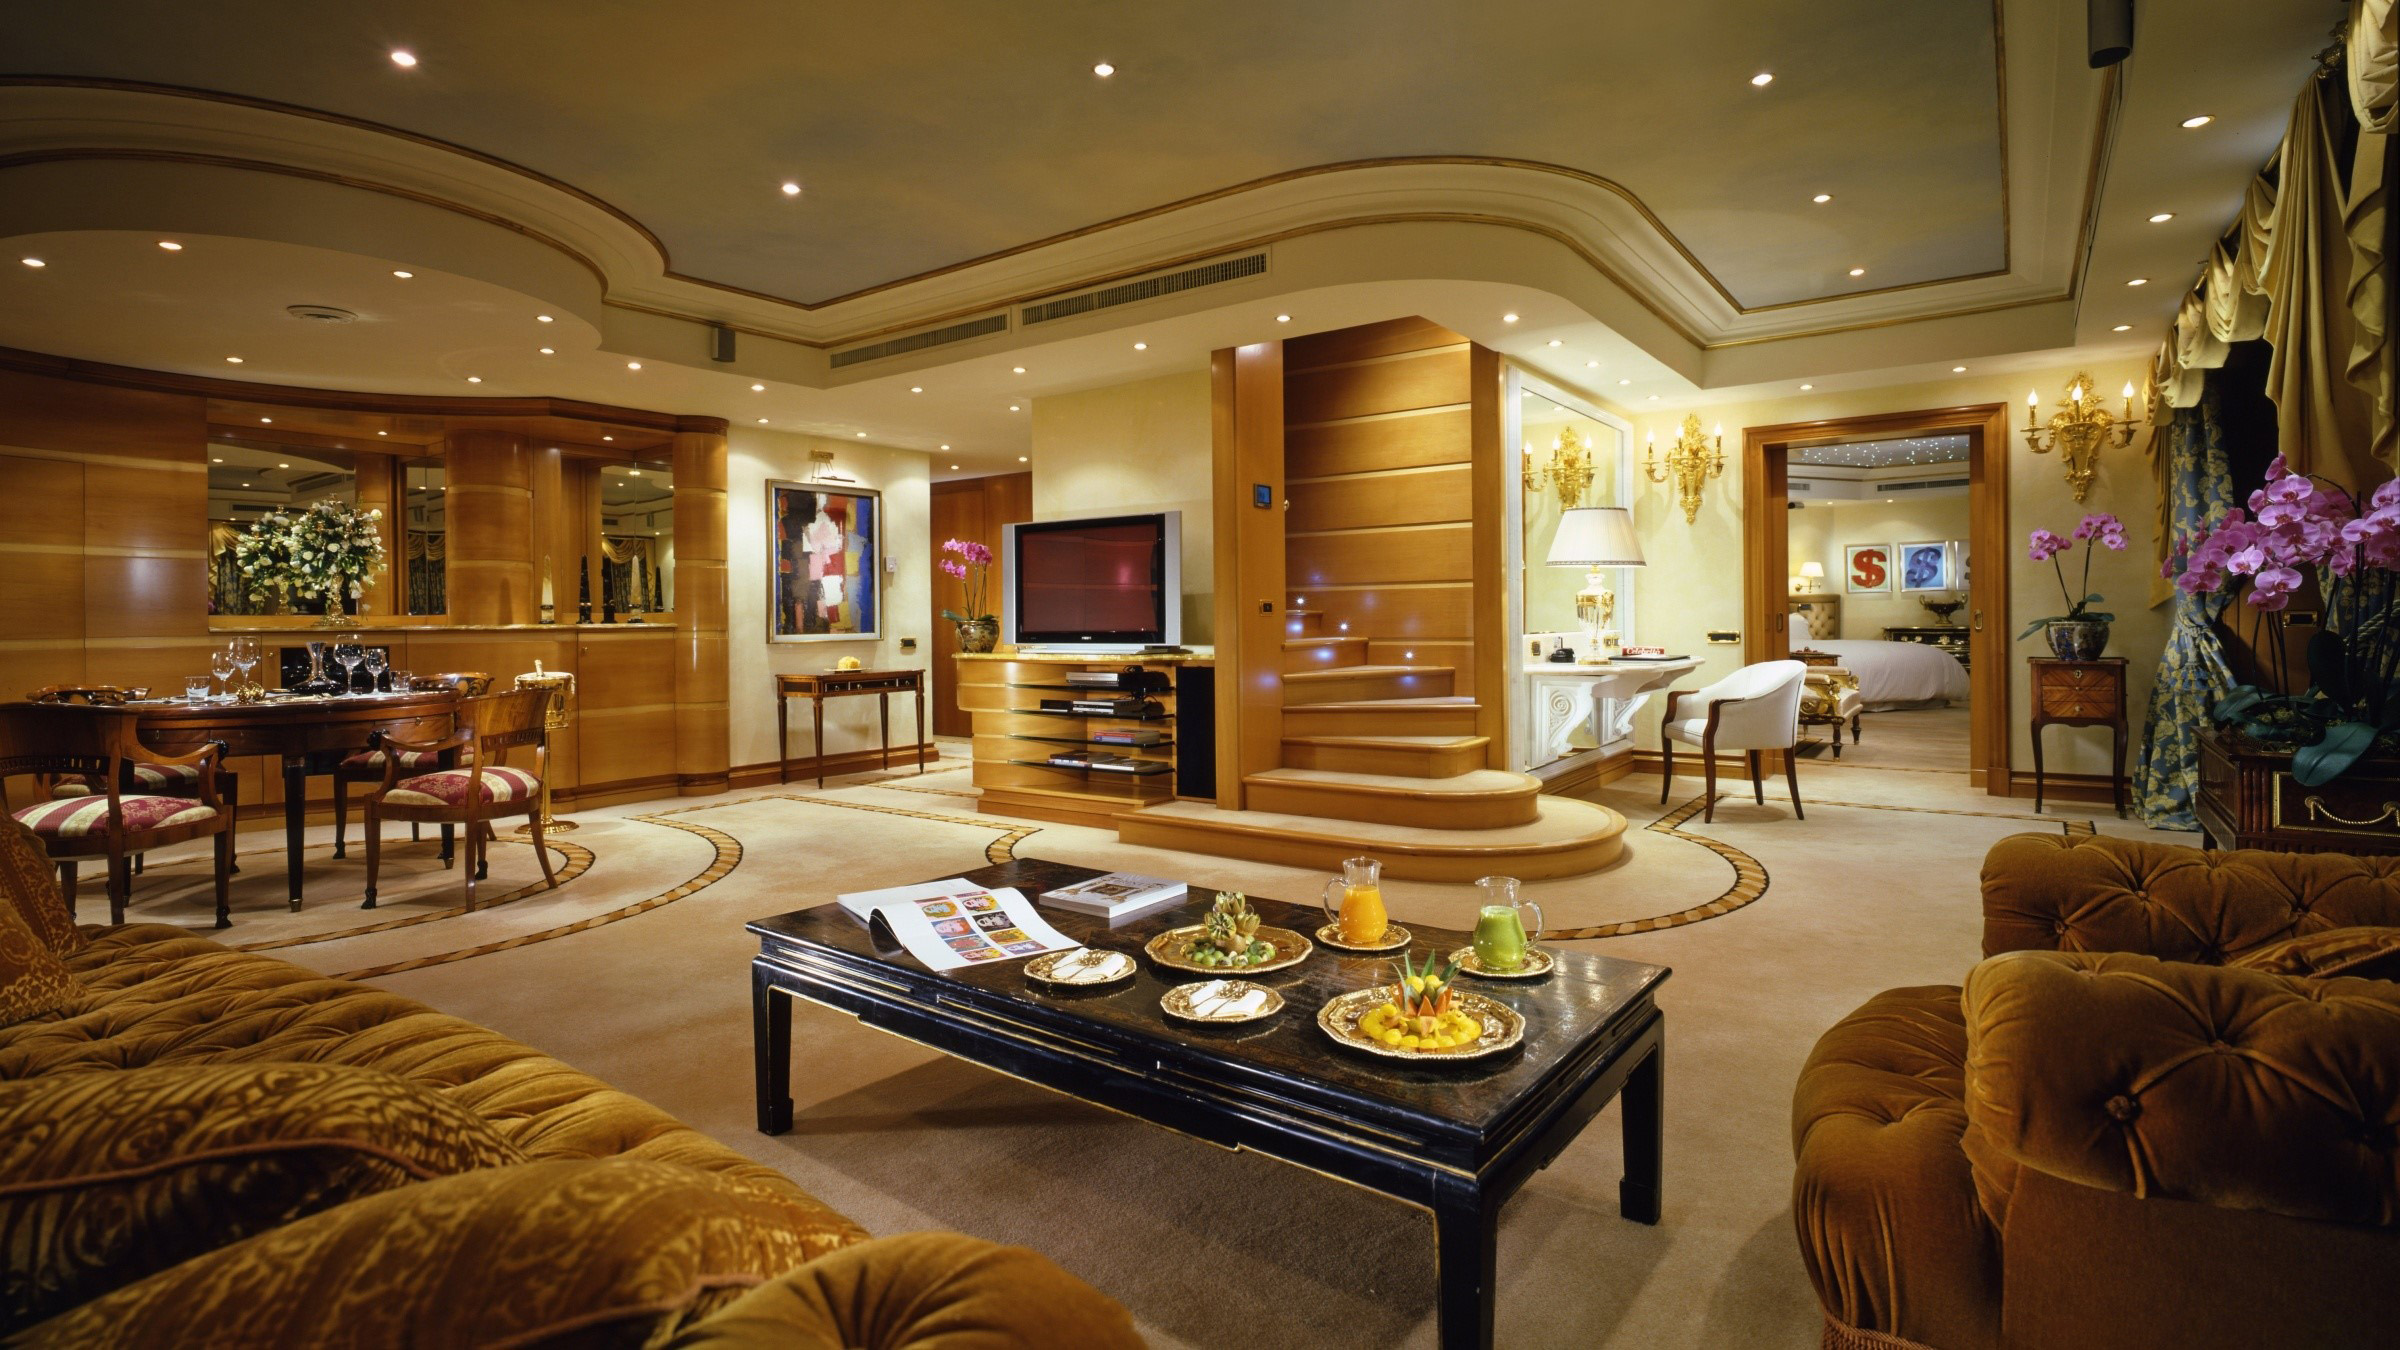 Wallpaper A luxurious apartment